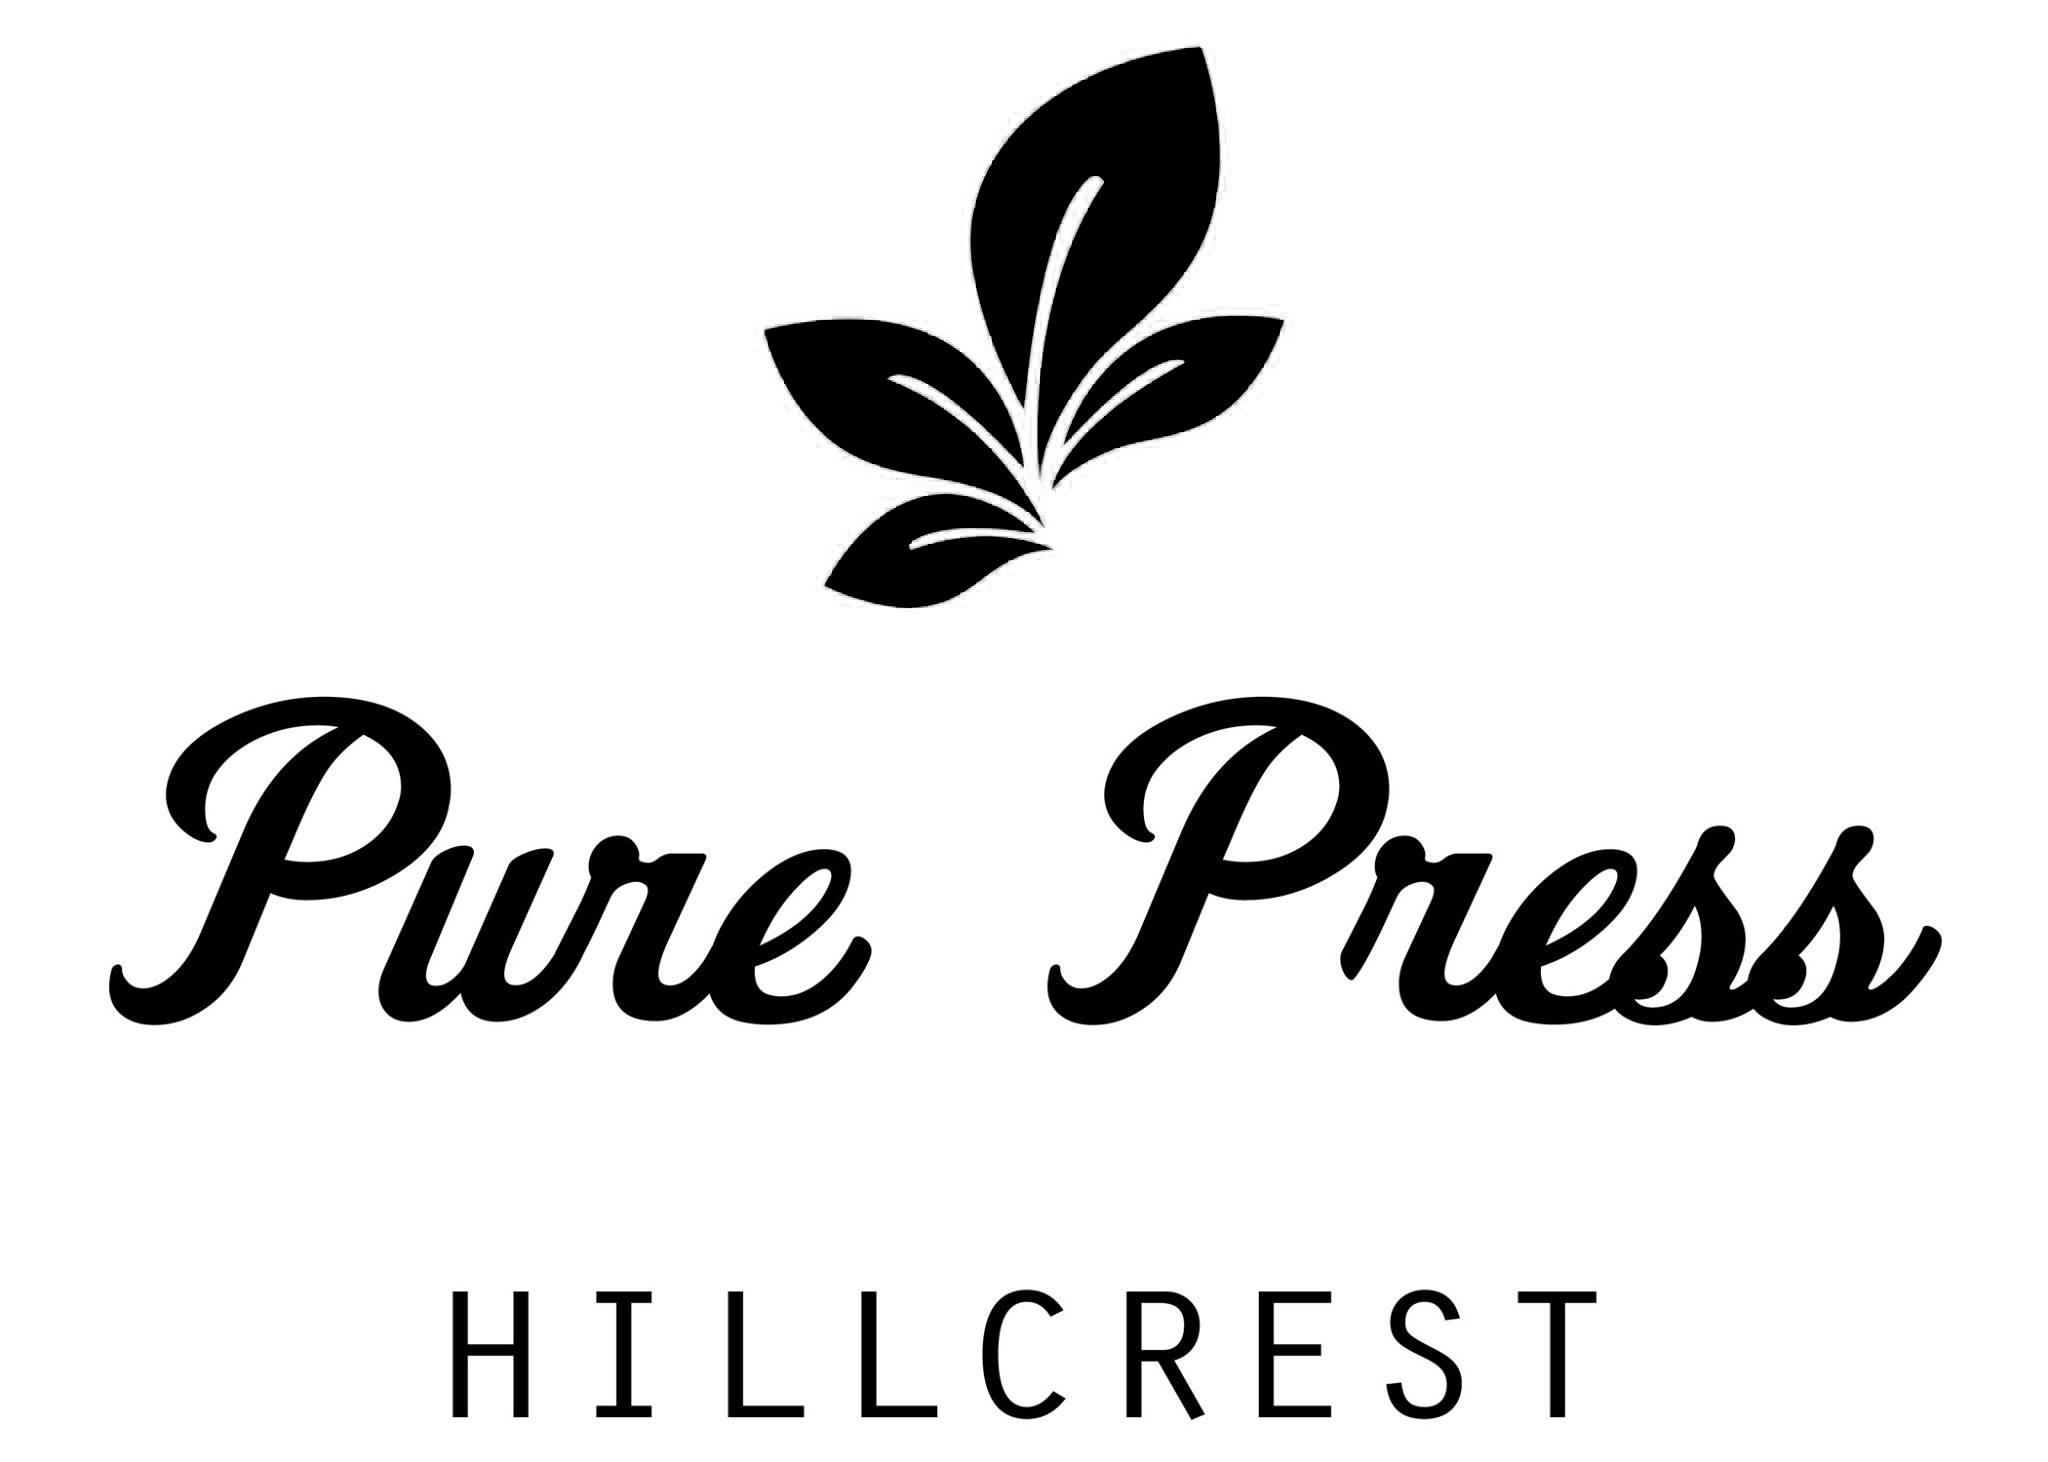 purepress